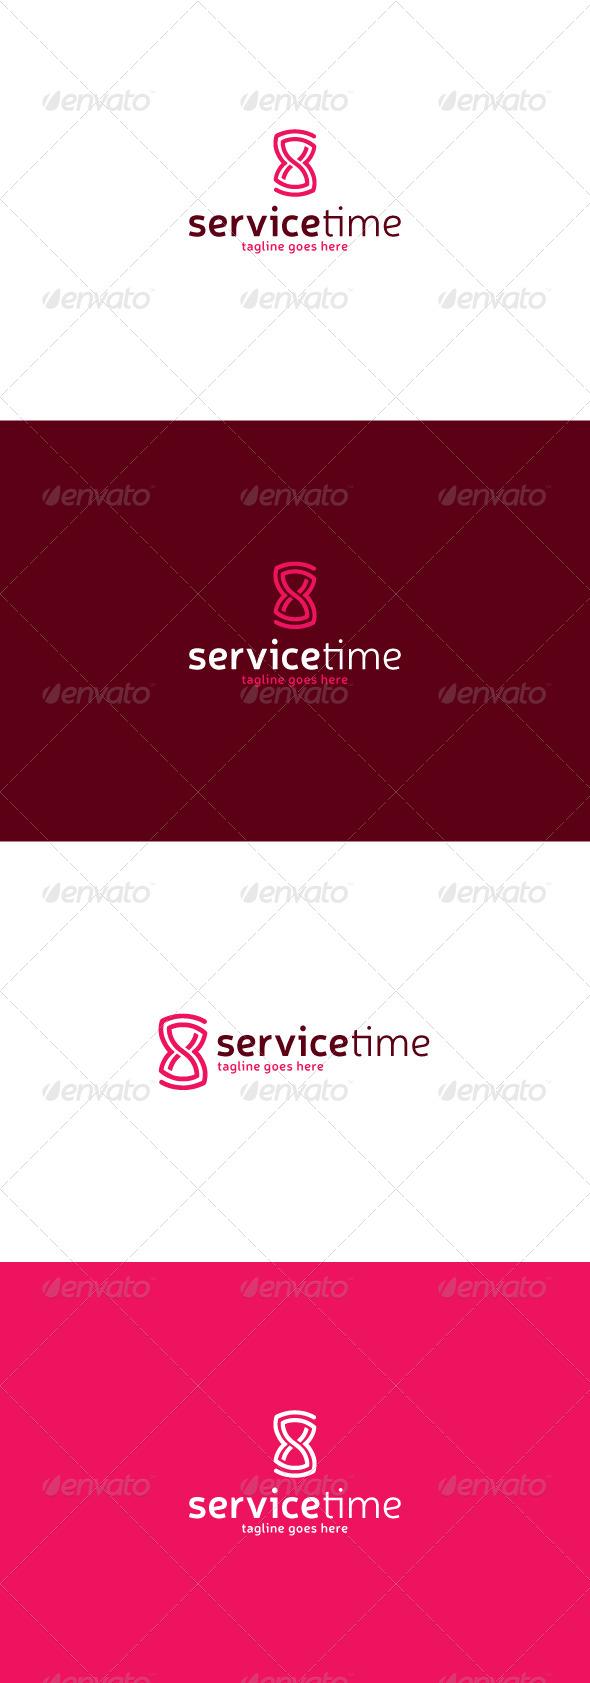 GraphicRiver Service Time Logo 7721356